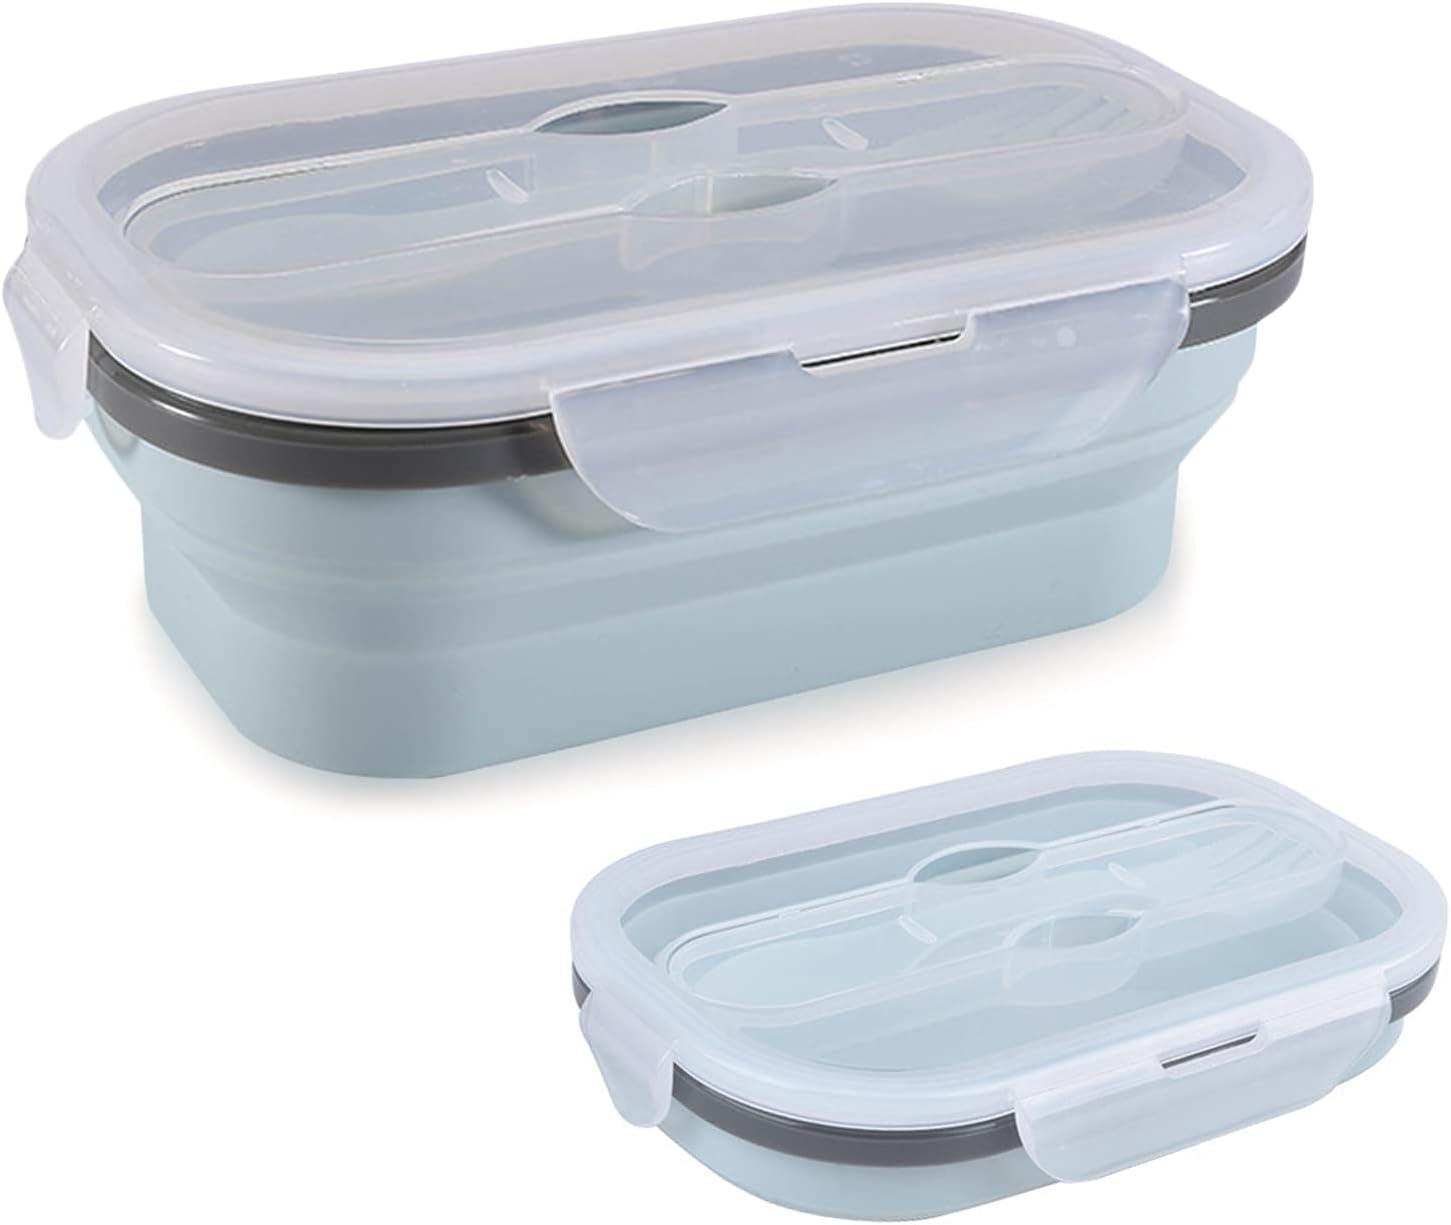 Gsrhzd Fiambrera Plegable, Fiambrera Plegable de Silicona, Plegable, fácil de Transportar, Apto para almacenar y conservar Alimentos (Azul)